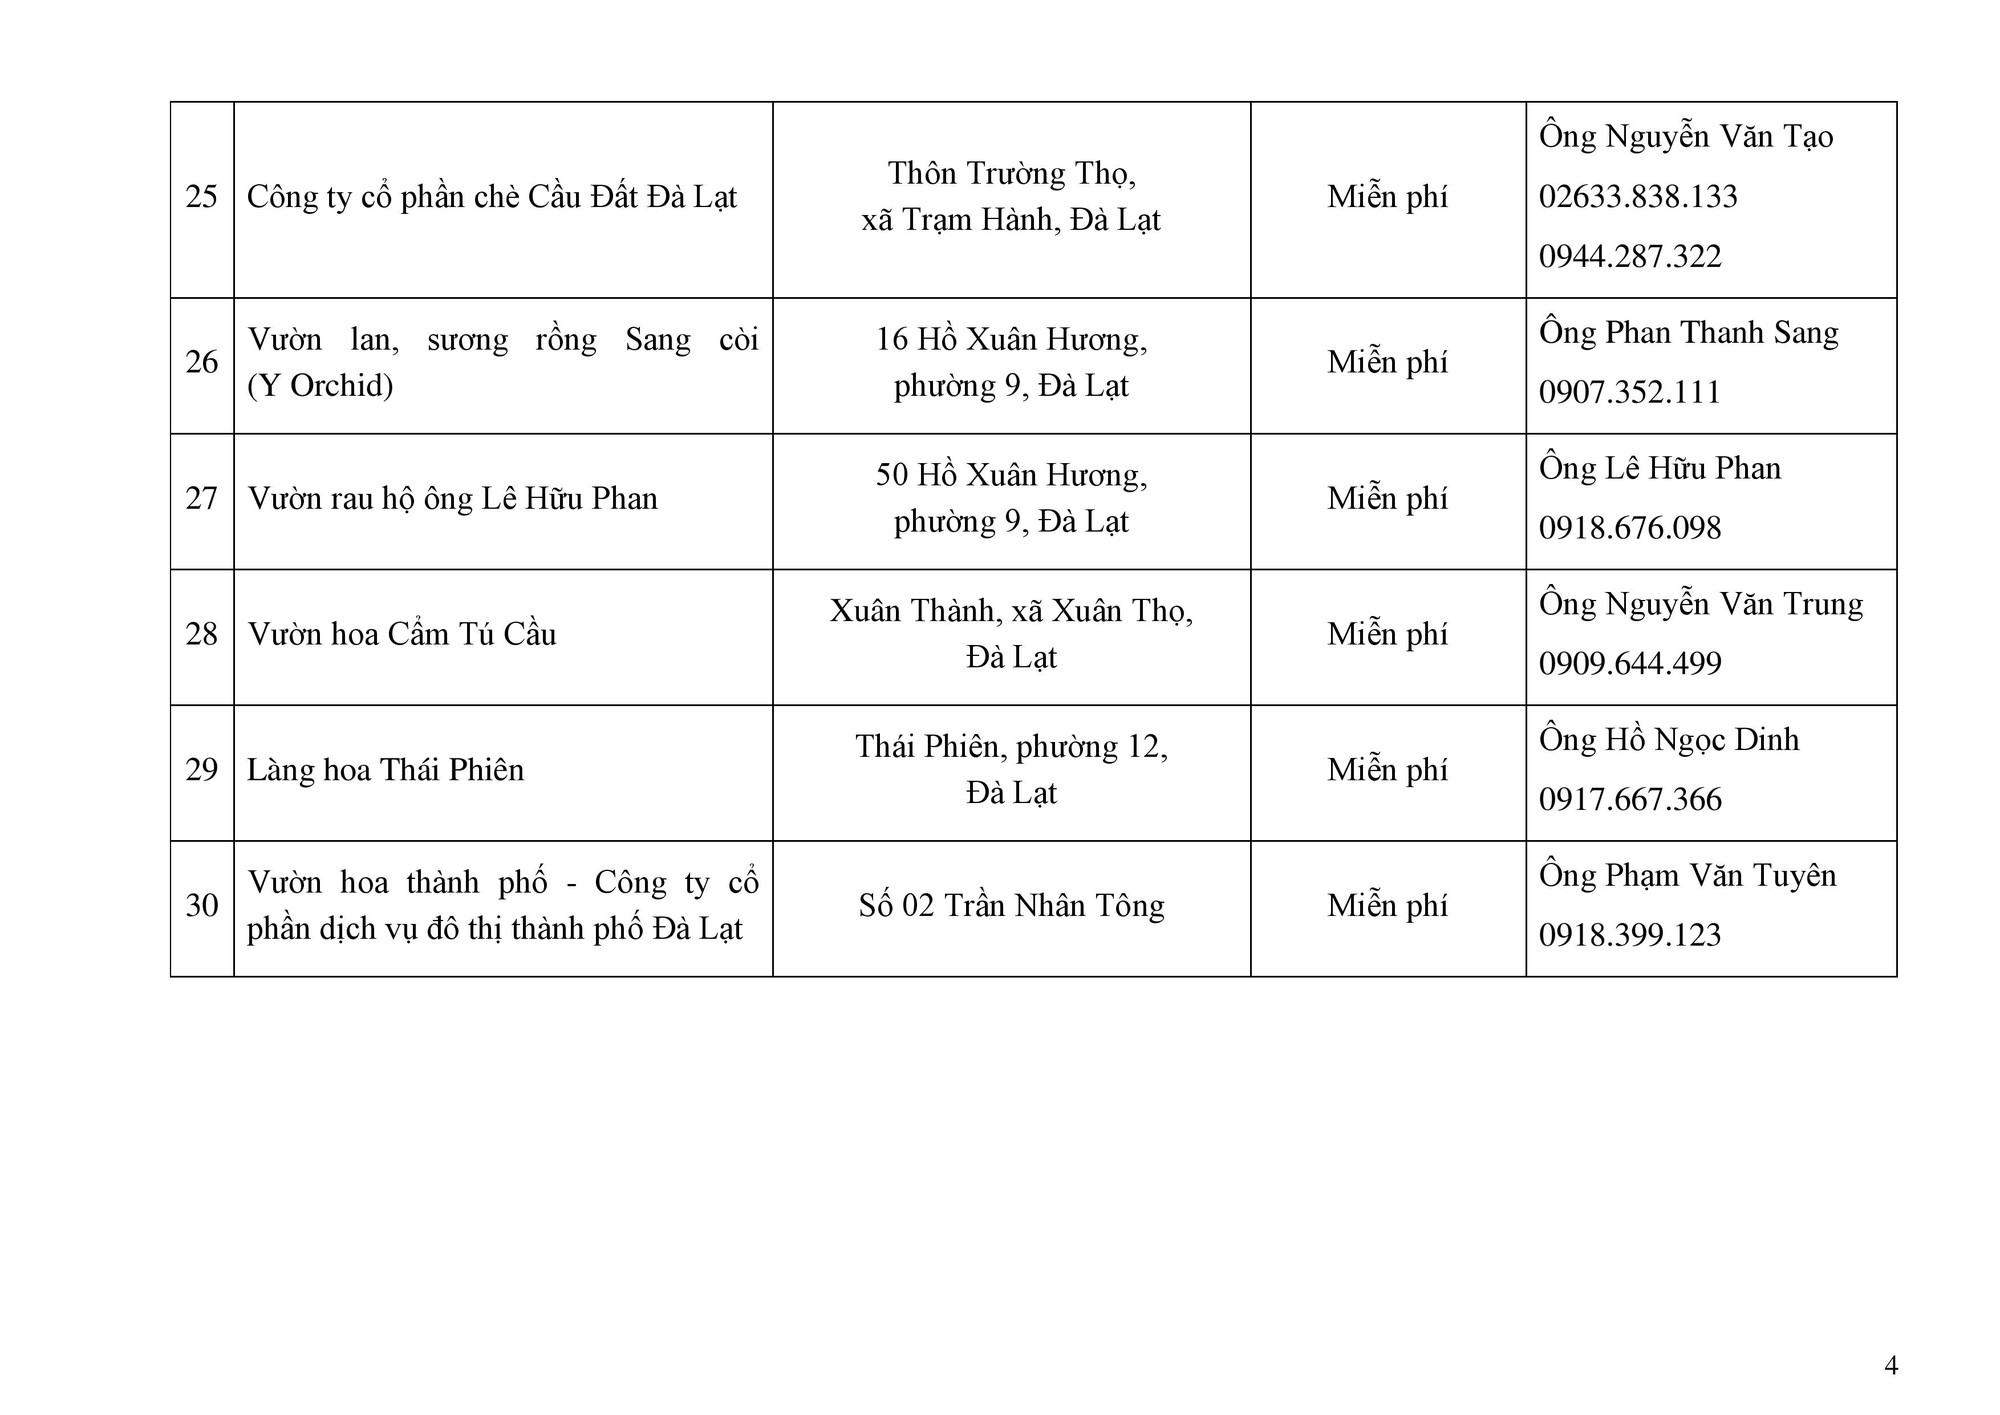 danh-sach-khu-diem-du-lich-ho-tro-1-page-004